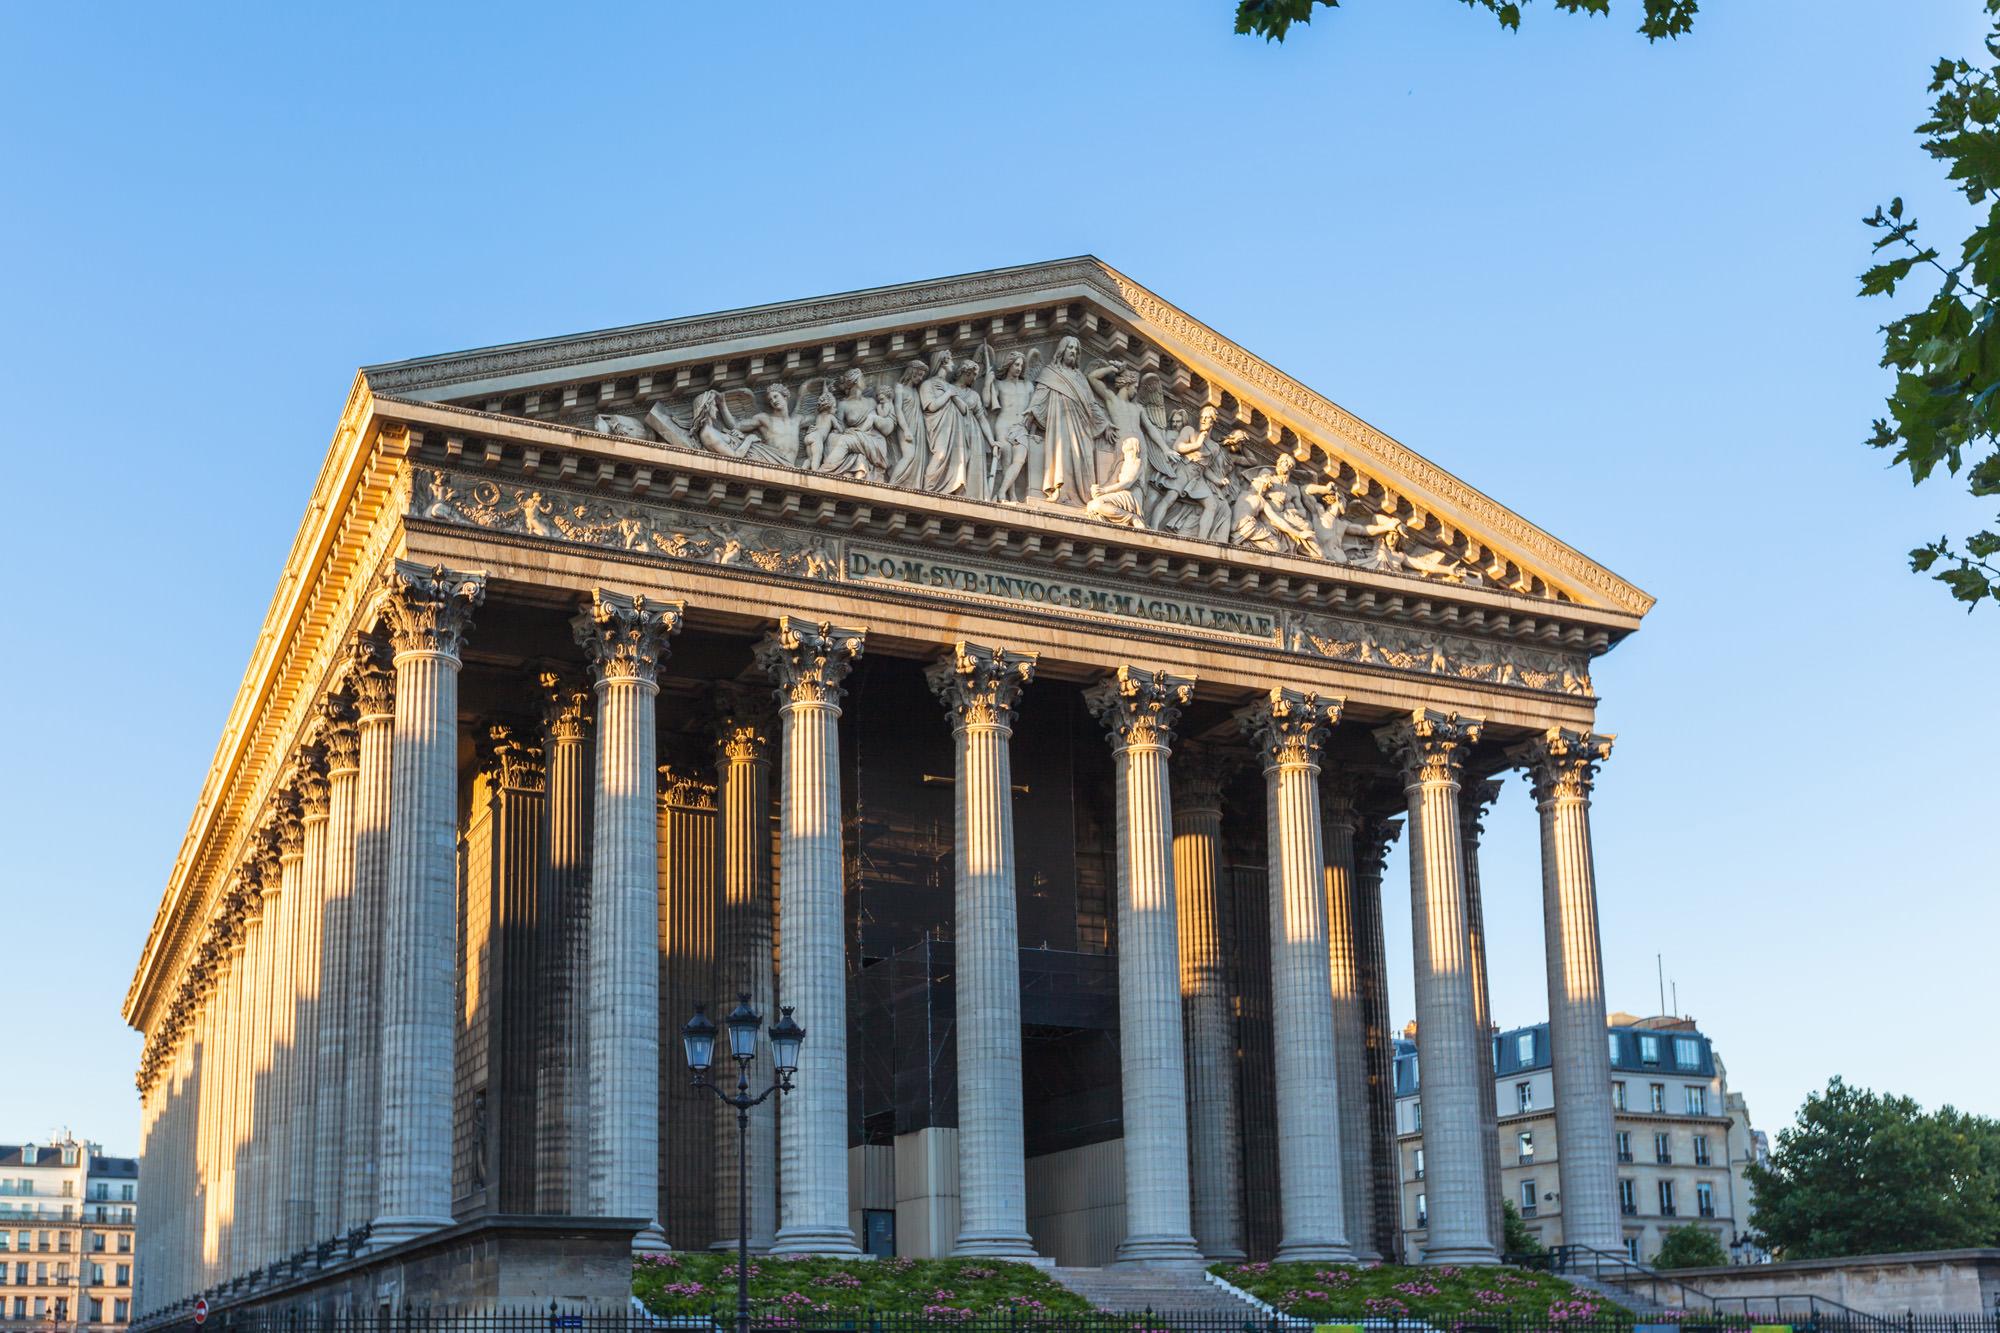 la madeleine paris kirche napoleon griechischer tempel. Black Bedroom Furniture Sets. Home Design Ideas